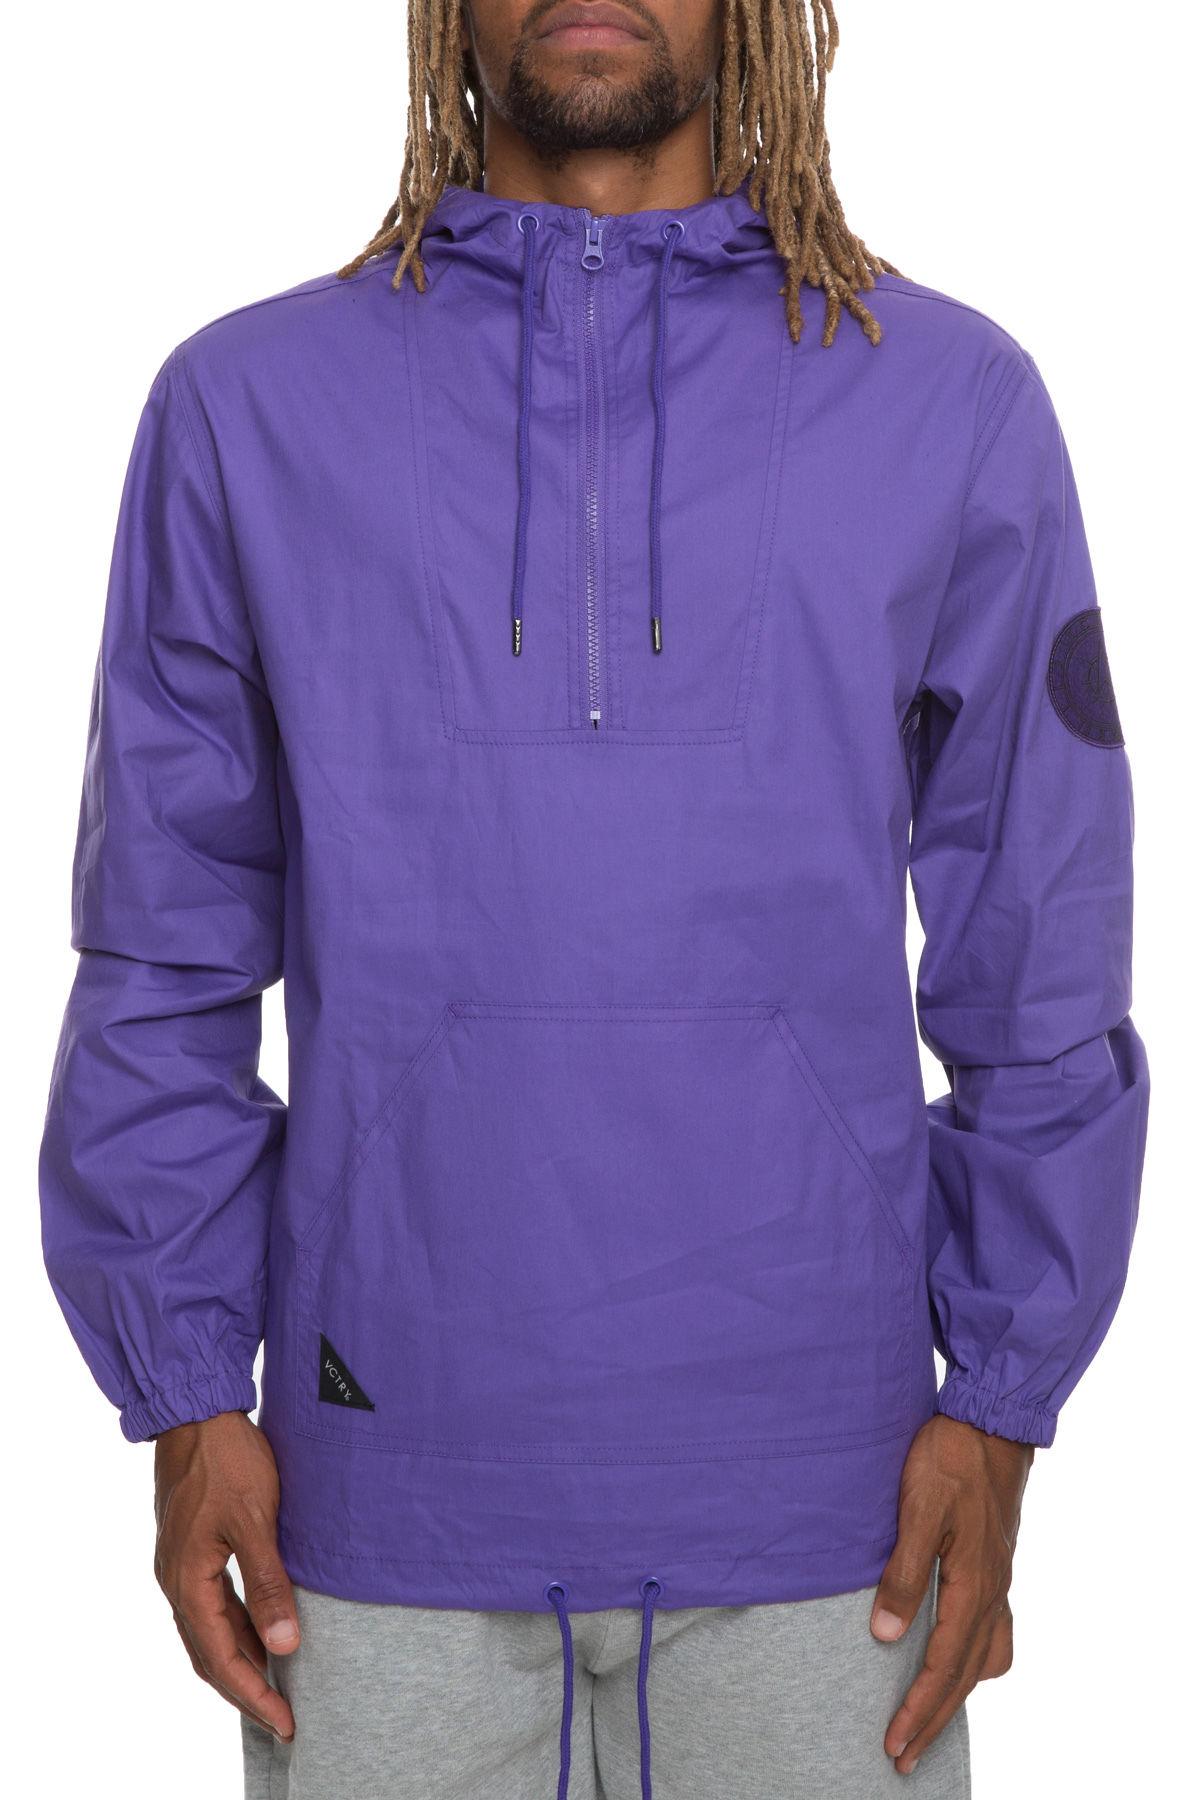 Image of 10 Deep XXX USA Navigator Cotton Windbreaker in Purple